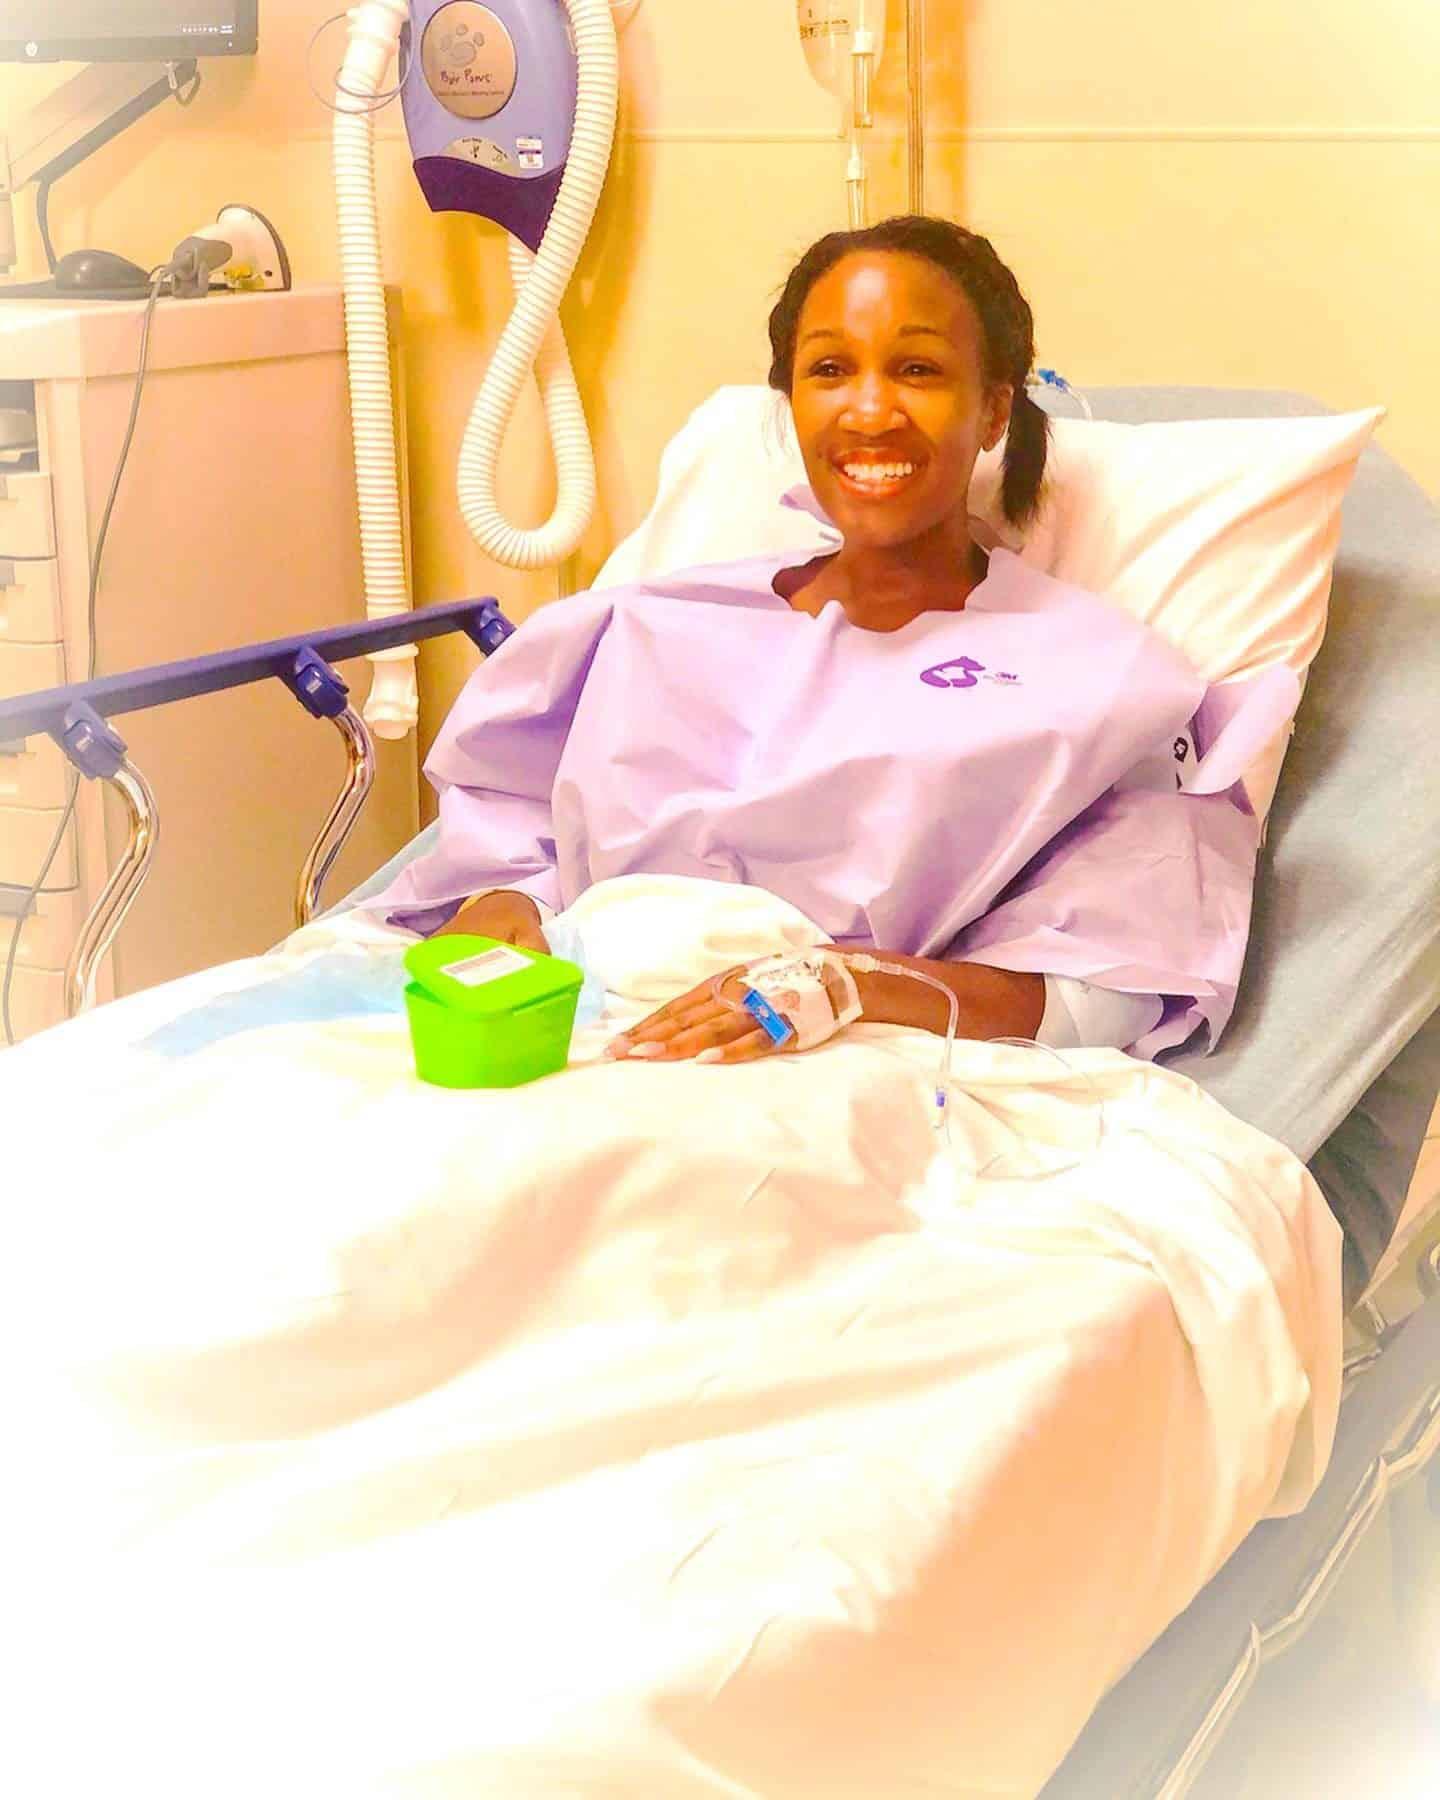 ShaundaNecole.com- Sentara Leigh Hospital hysterectomy surgery